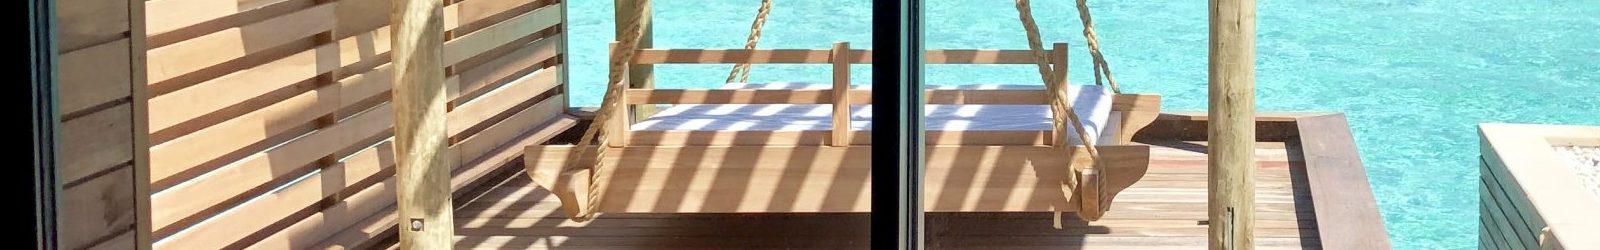 Exterpark Magnet Angelim Amargoso – Maldive